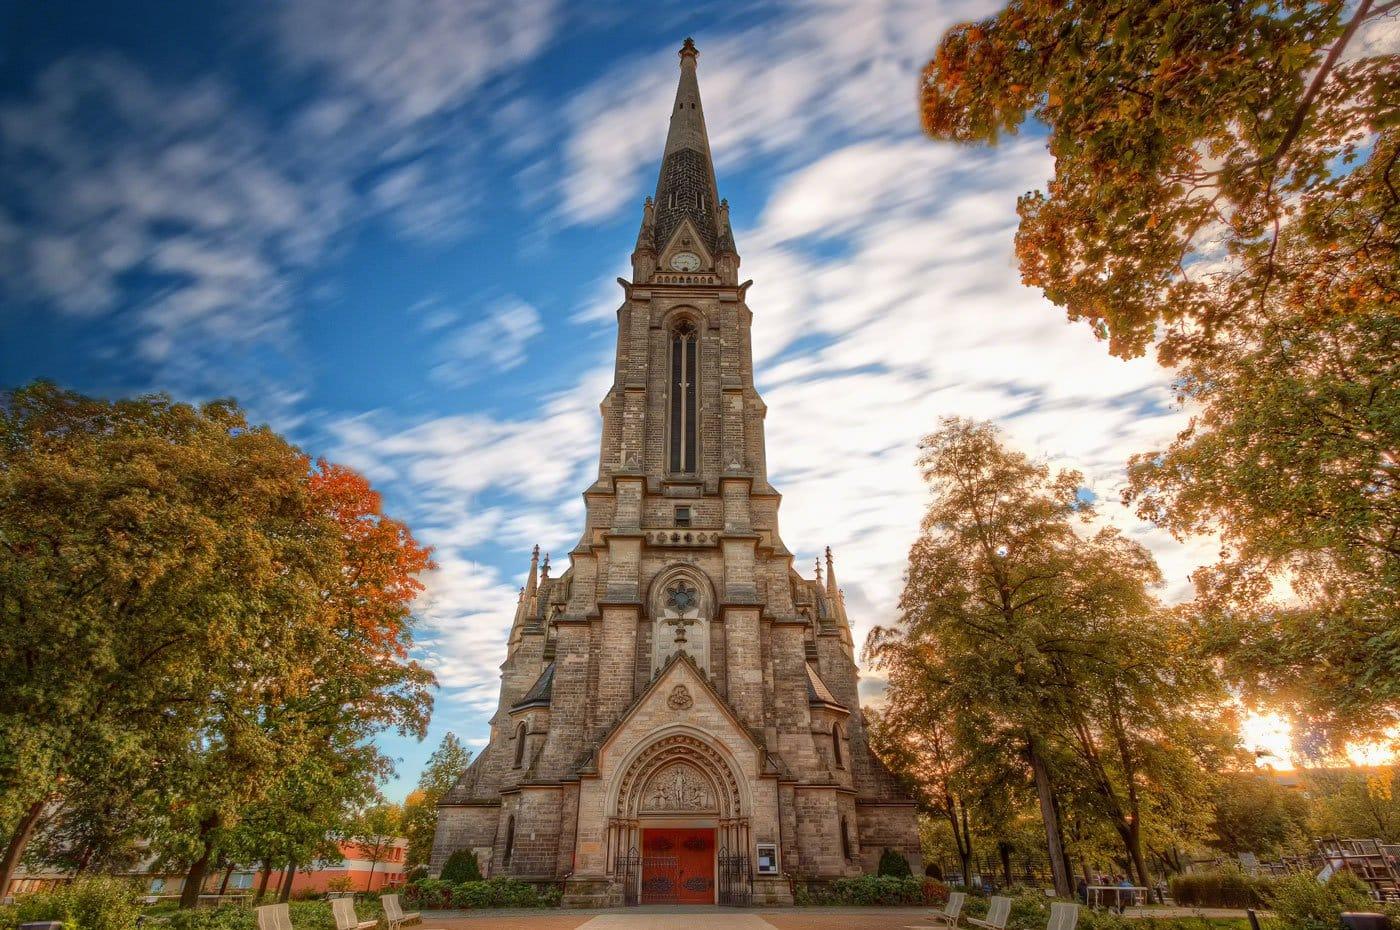 St. Sebastian Kirche im Berliner Stadtteil Gesundbrunnen